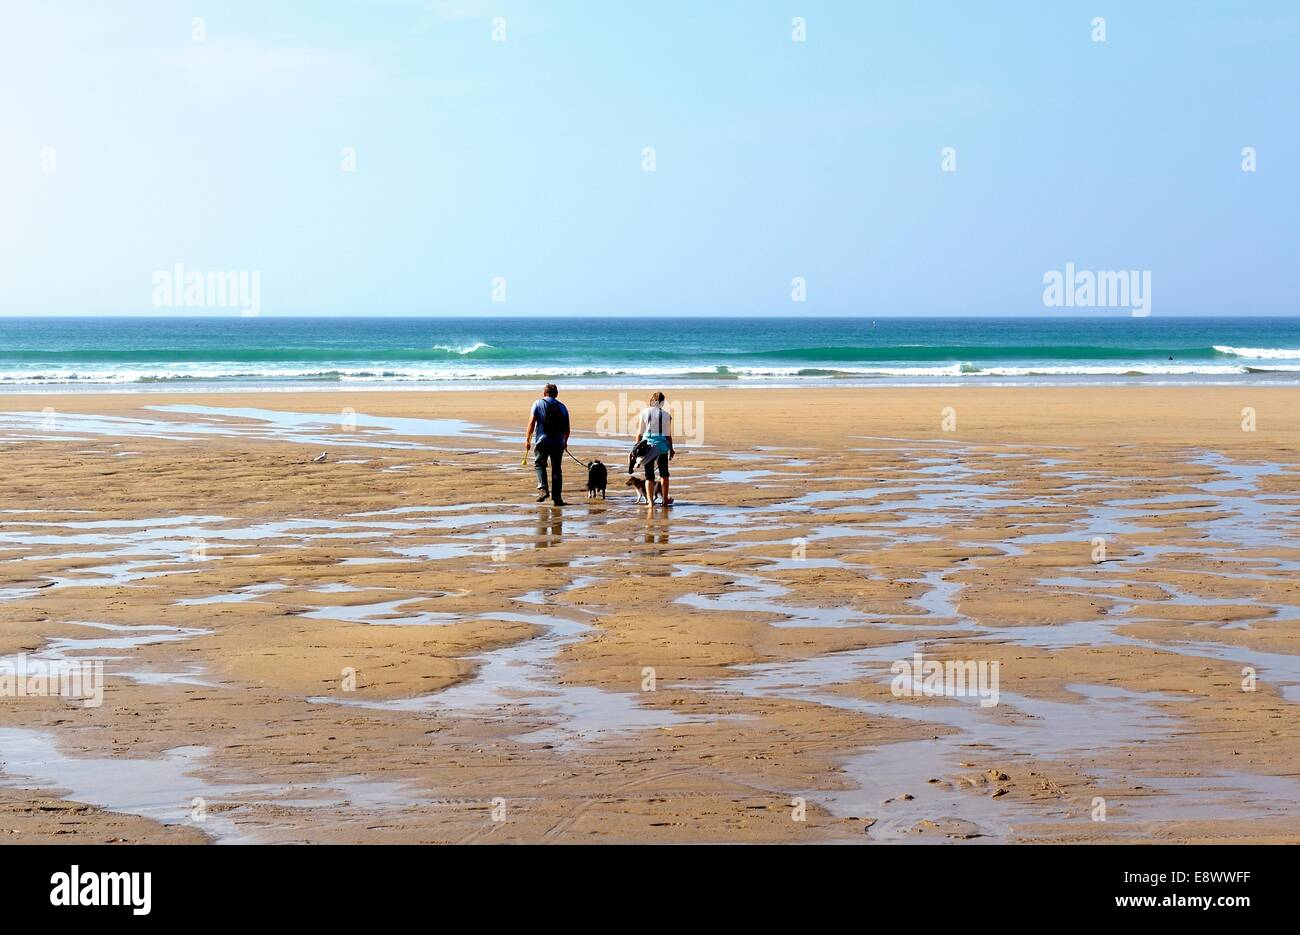 A couple walking a dog on Penhale beach Cornwall England uk - Stock Image